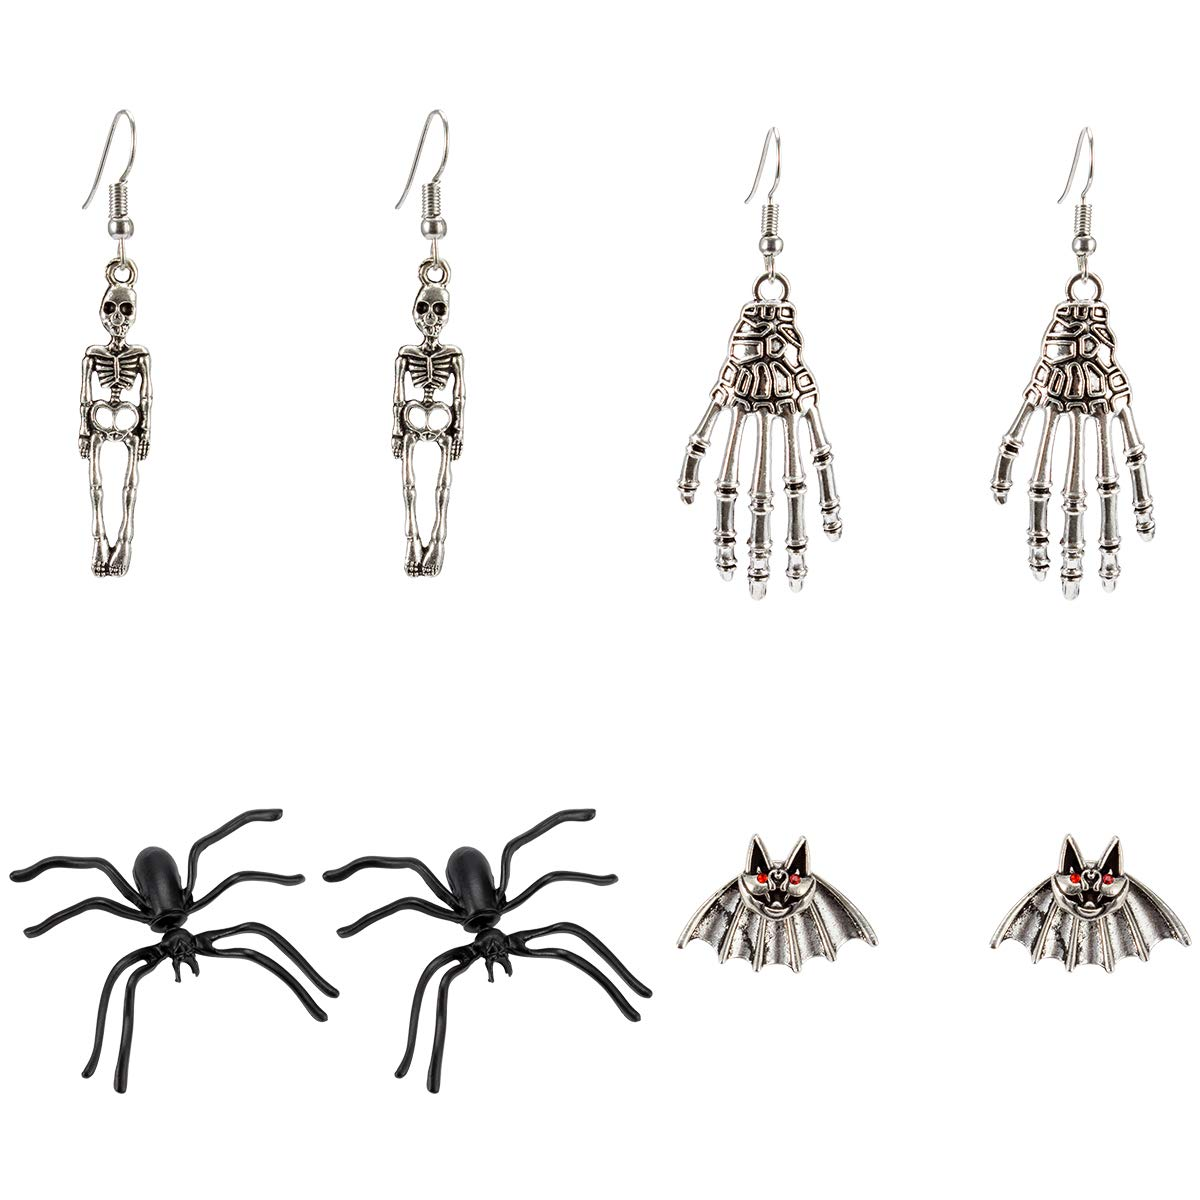 MEWTOGO 4 Packs Halloween Drop Earrings Including Spiders+Human Skeleton +Skeleton Hands+Bats Dangle Earring Set for Women and Girls Costume